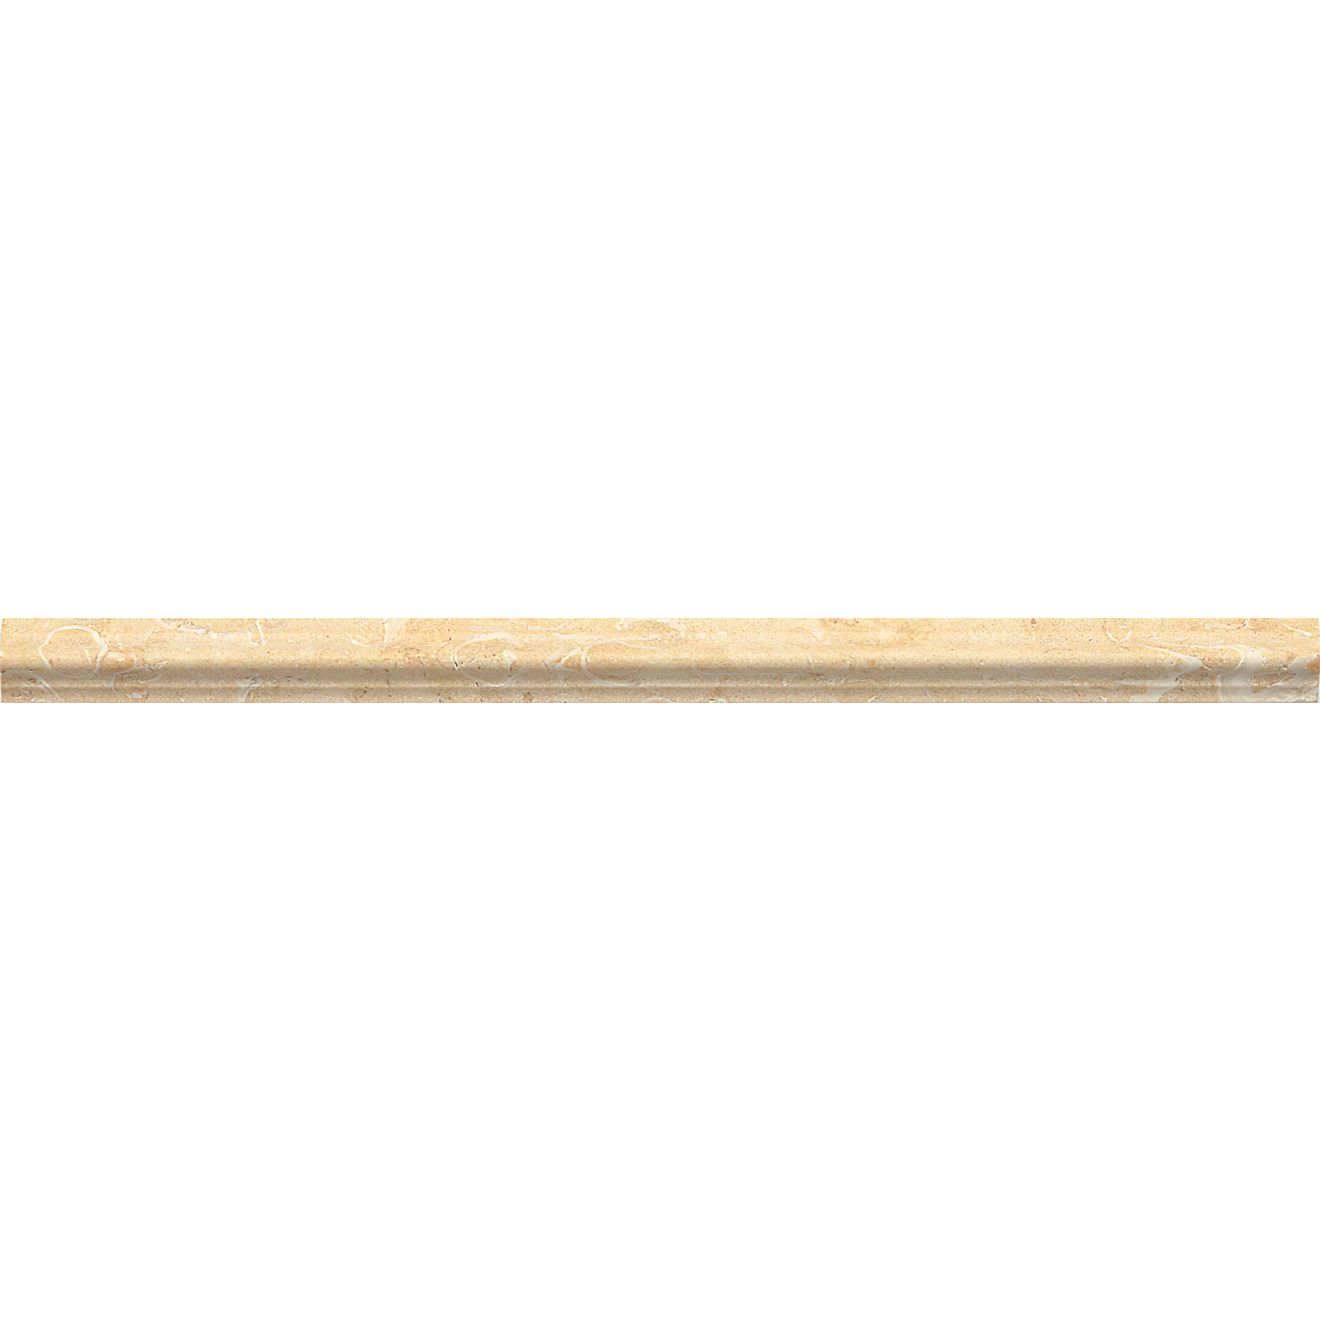 1X12 Mod Rocks Liner-Brioche